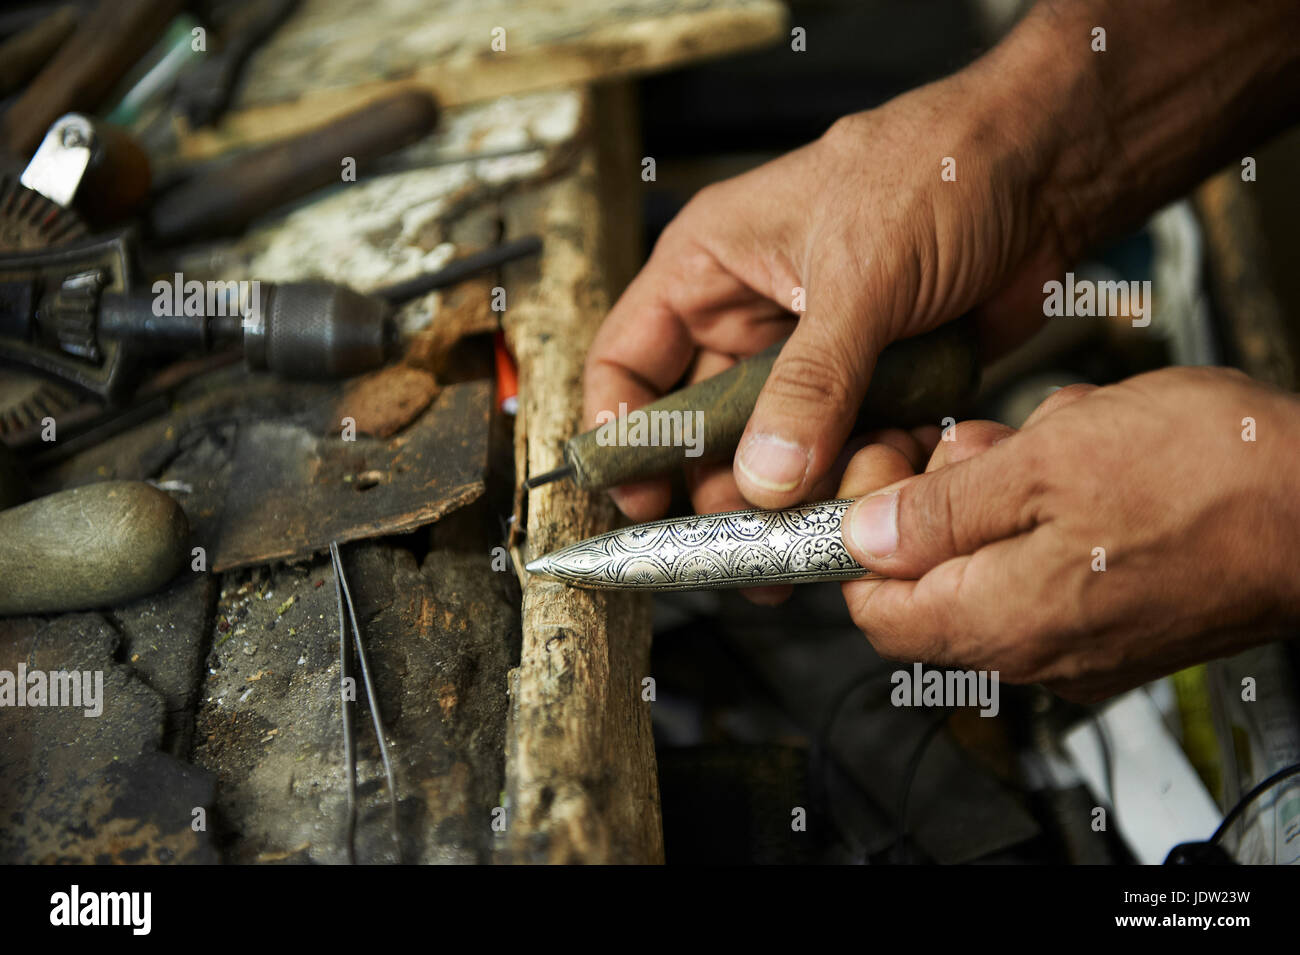 Close up of artisan carving metal - Stock Image